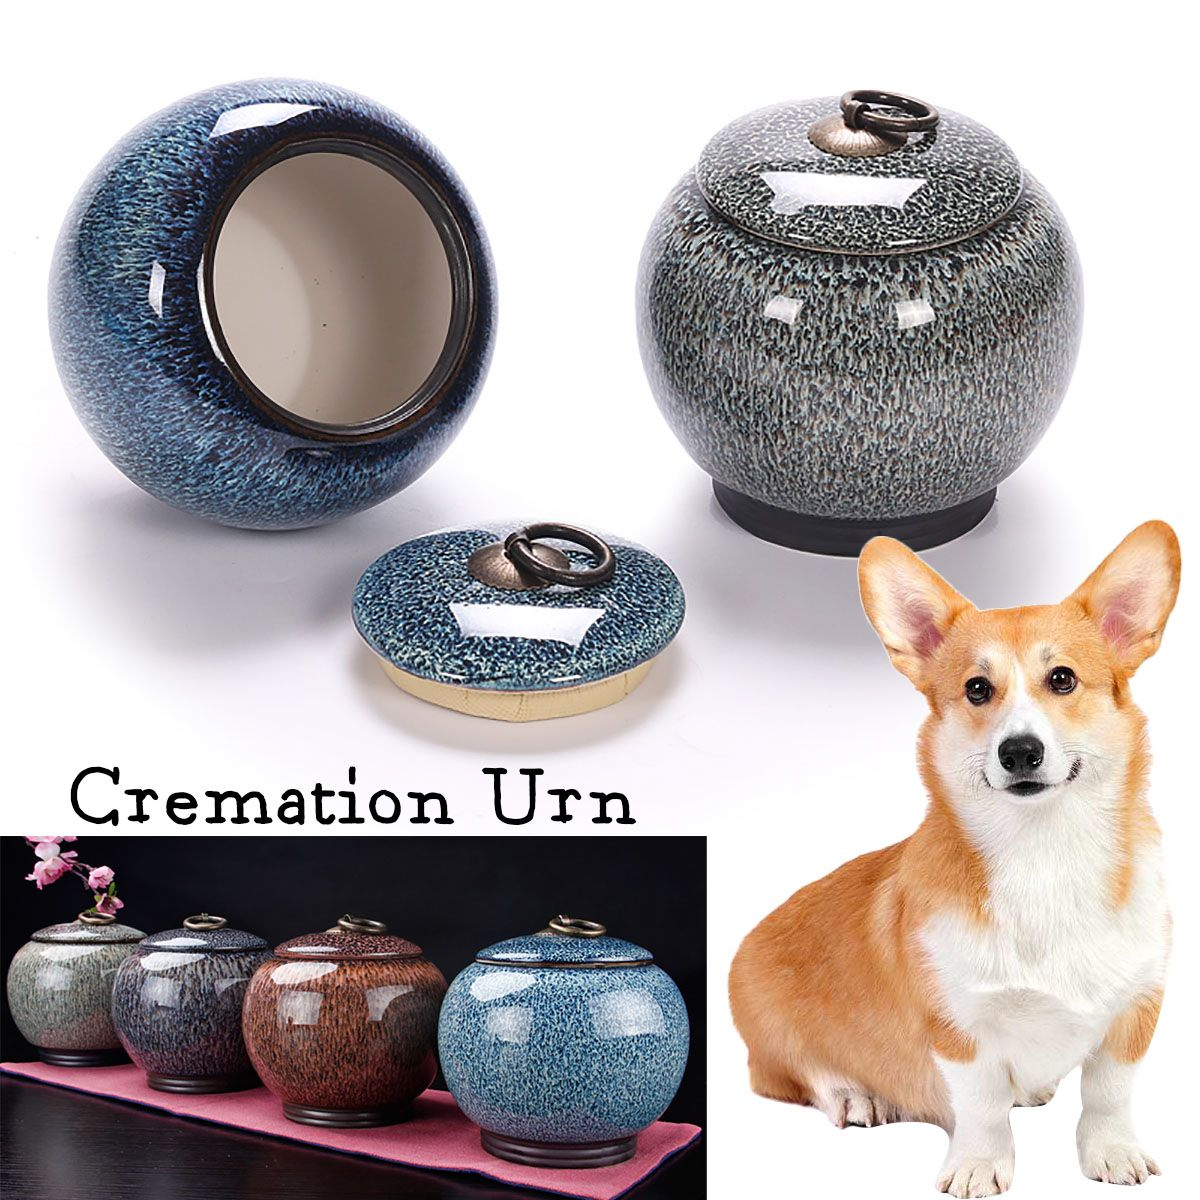 4 Color Ceramics Pet Cremation Memorial Urn Jar For Dog Cat Bird Mouse Ashes Keepsake Storage Box 12.5x11.5cm